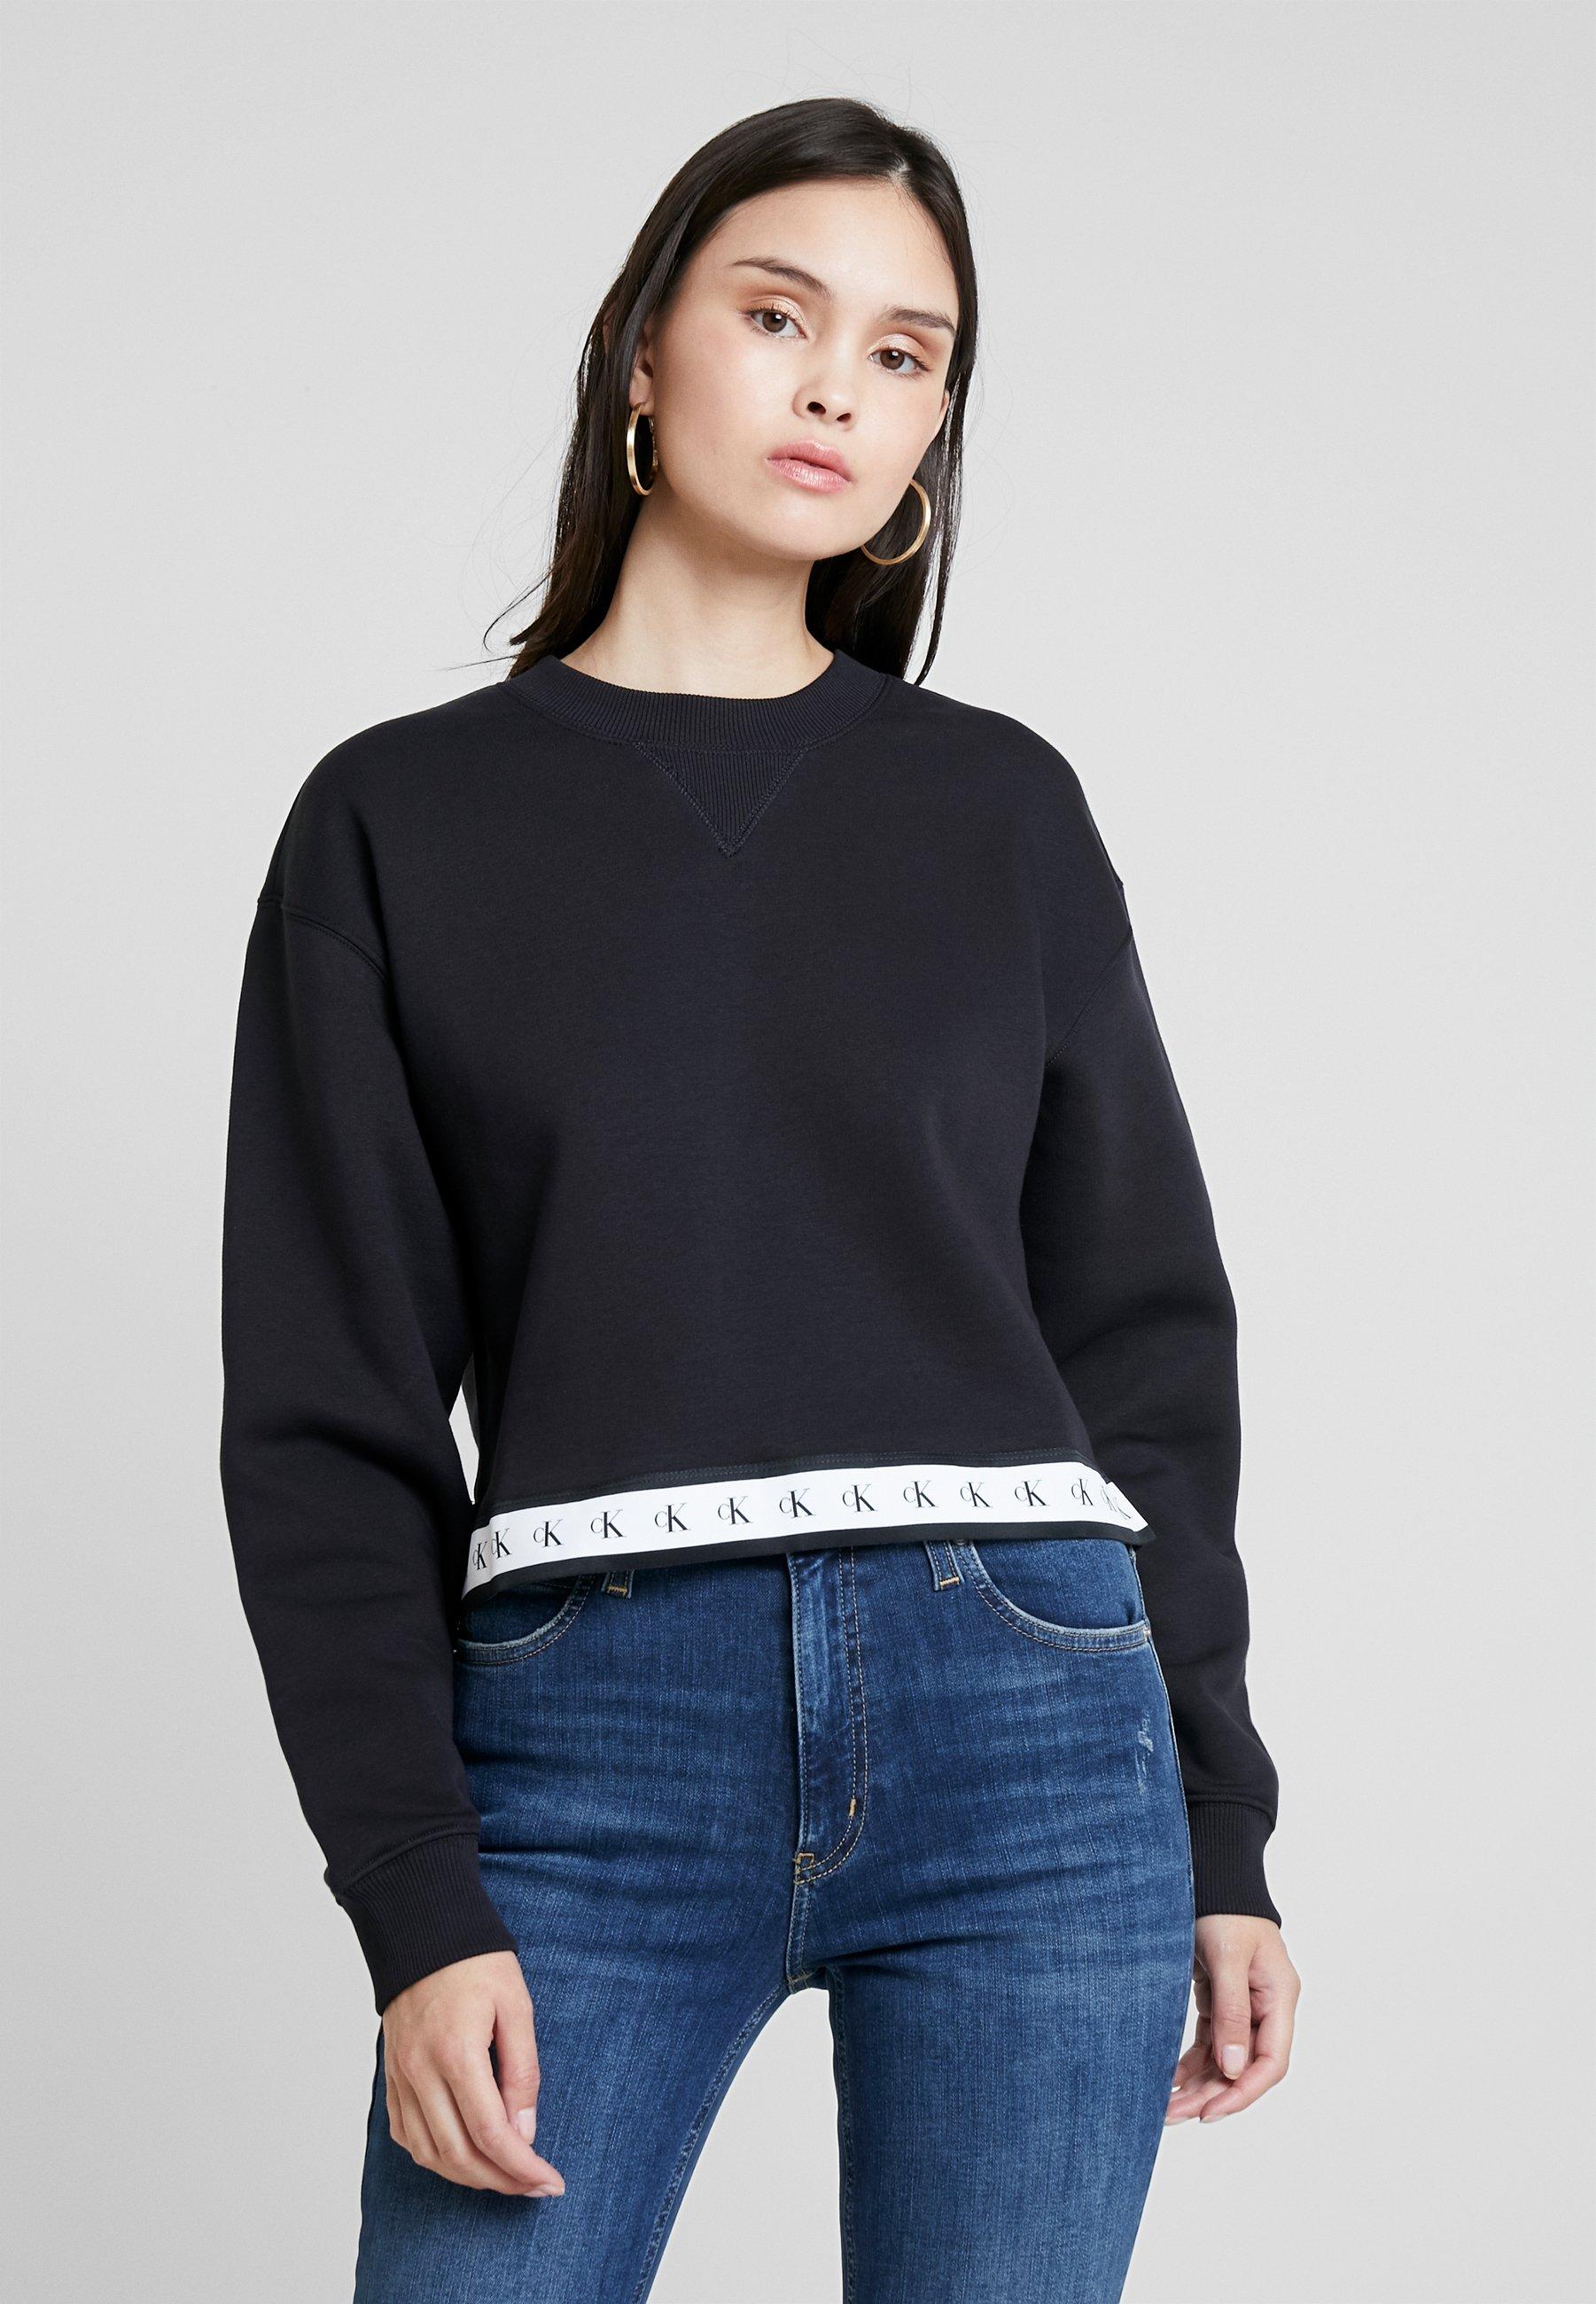 Jeans Crew Monogram NeckSweatshirt Black Tape Klein Calvin b76gvIYfy